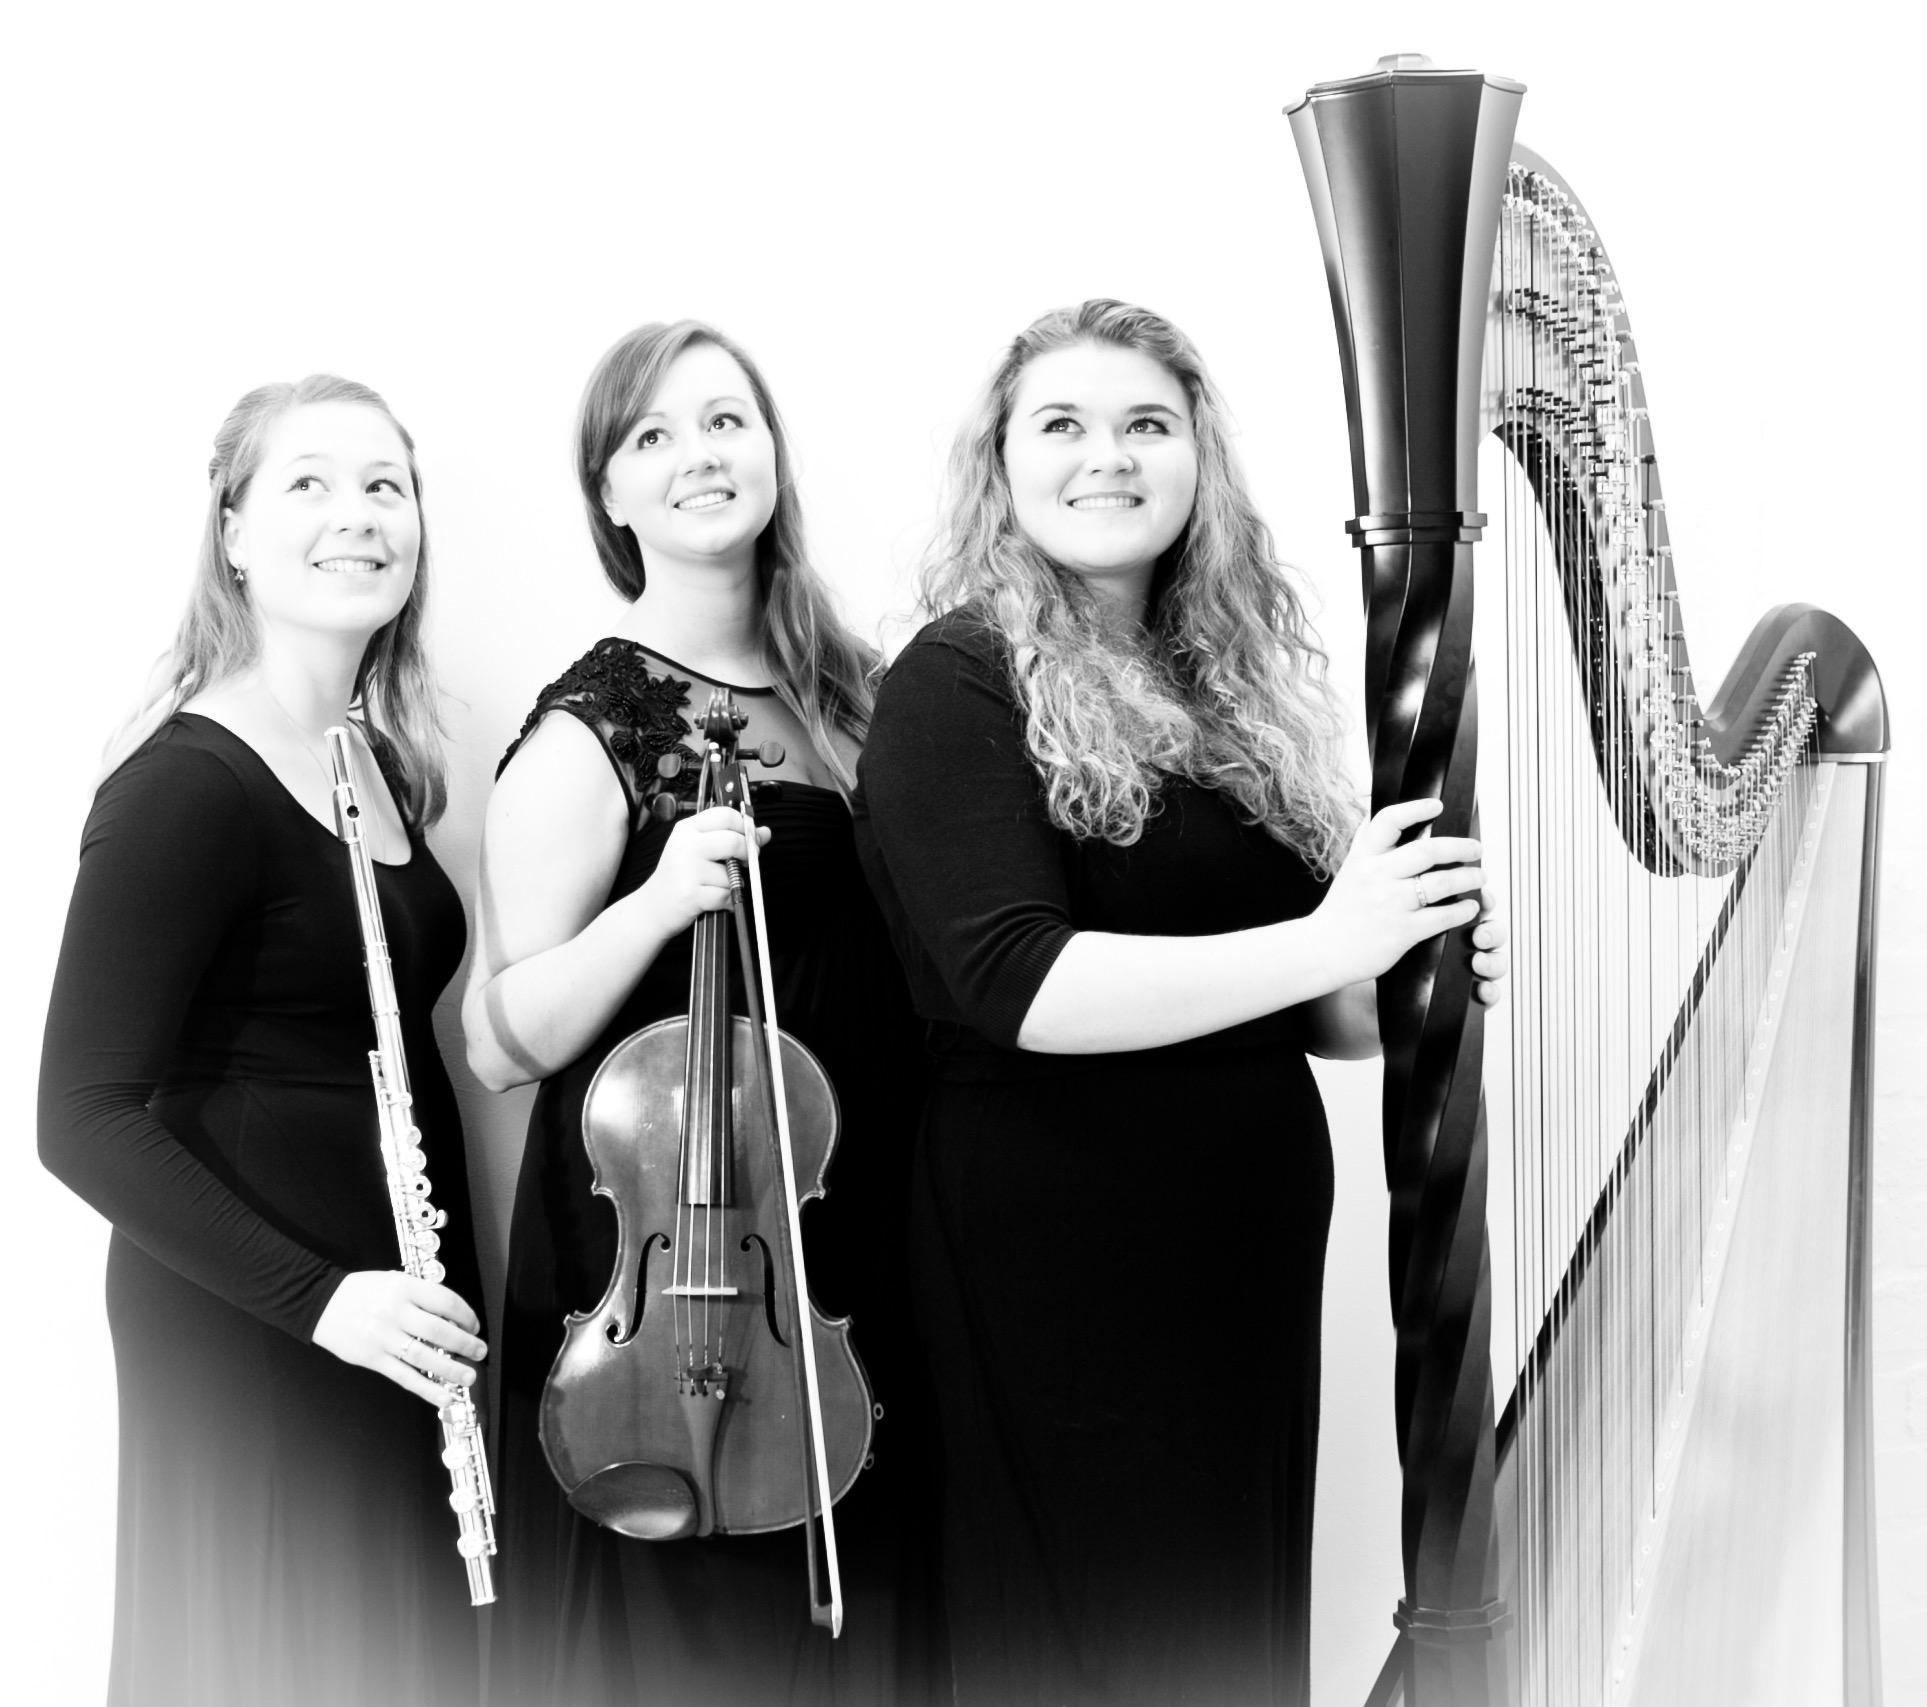 Lavena Trio - Liy Caunt, Jessica Thornhill, Chloe Roberts